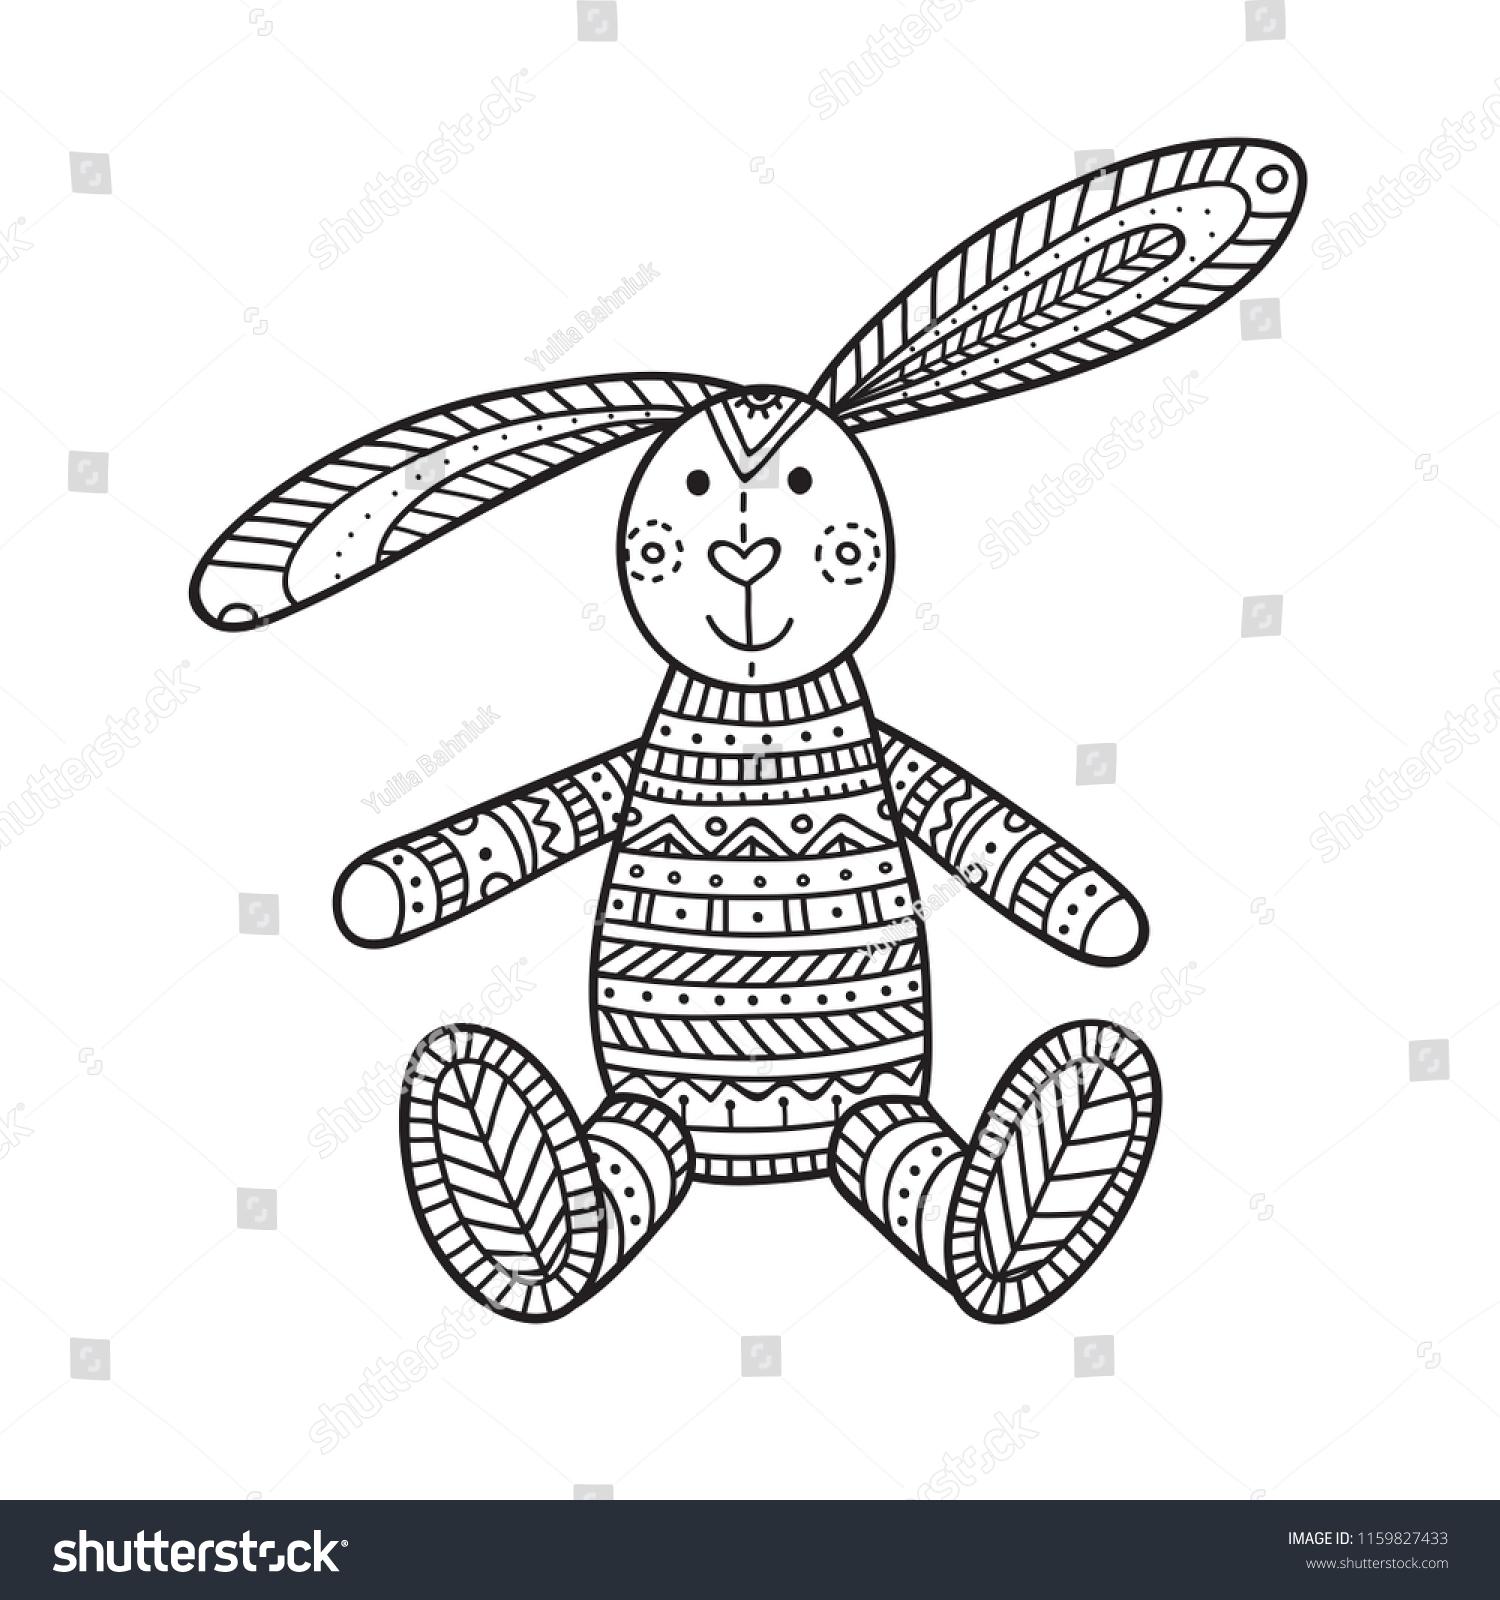 Vector Illustration Handmade Bunny Toy Can Stock Vector (Royalty ...